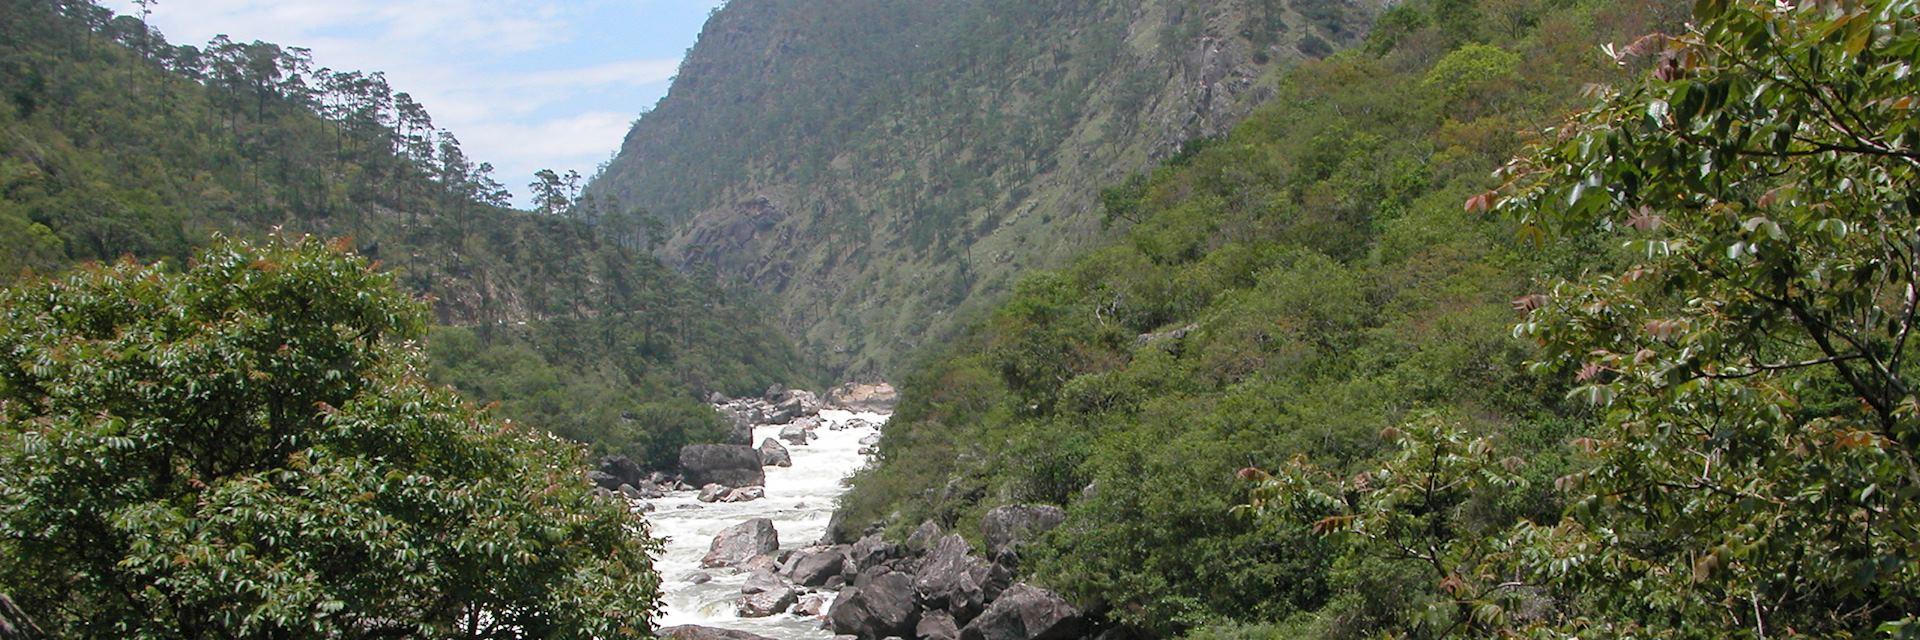 Wangdi Valley